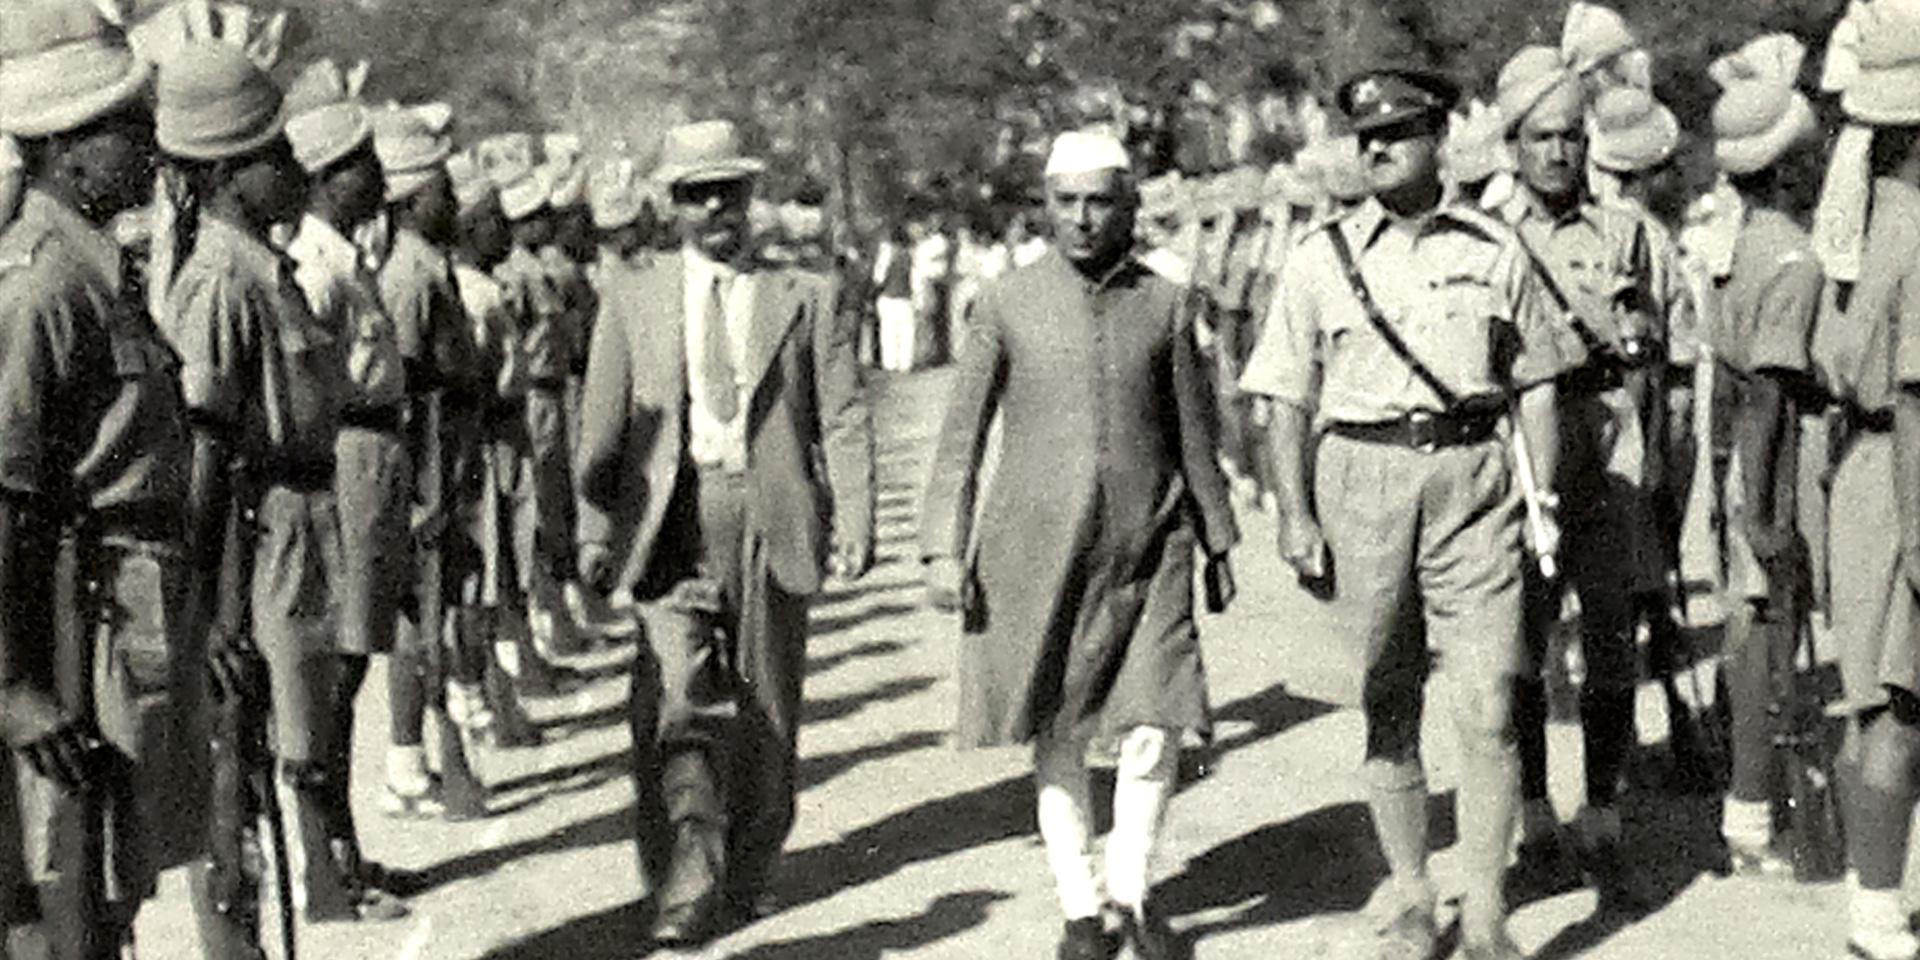 Nehru visiting the Khyber Rifles at Jamrud, 1946